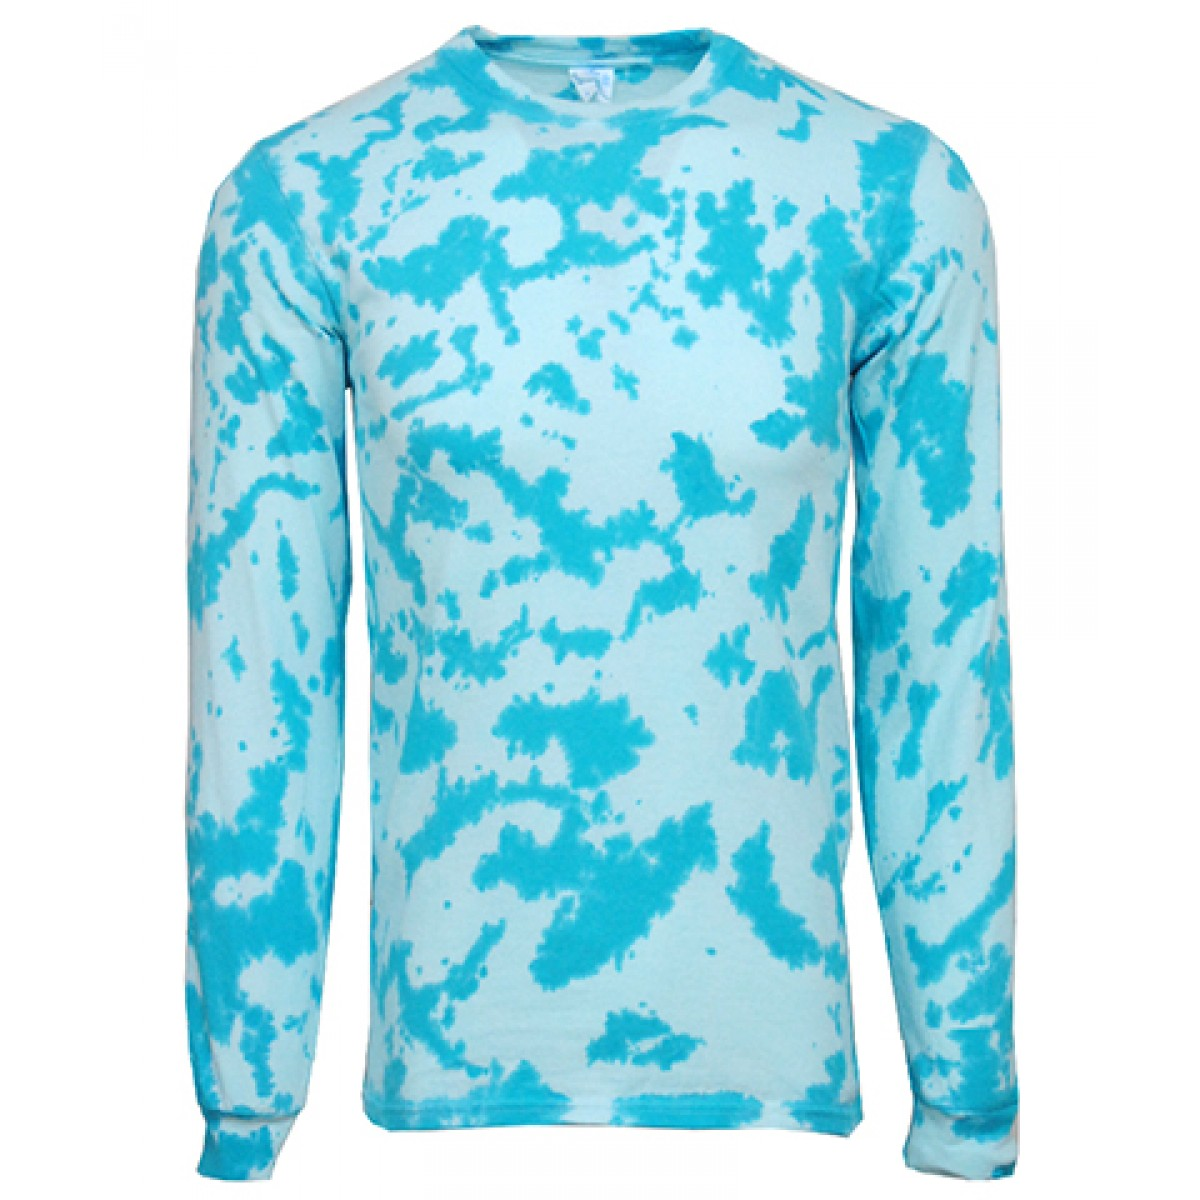 Tie-Dye Long Sleeve Shirts-Blue-YM